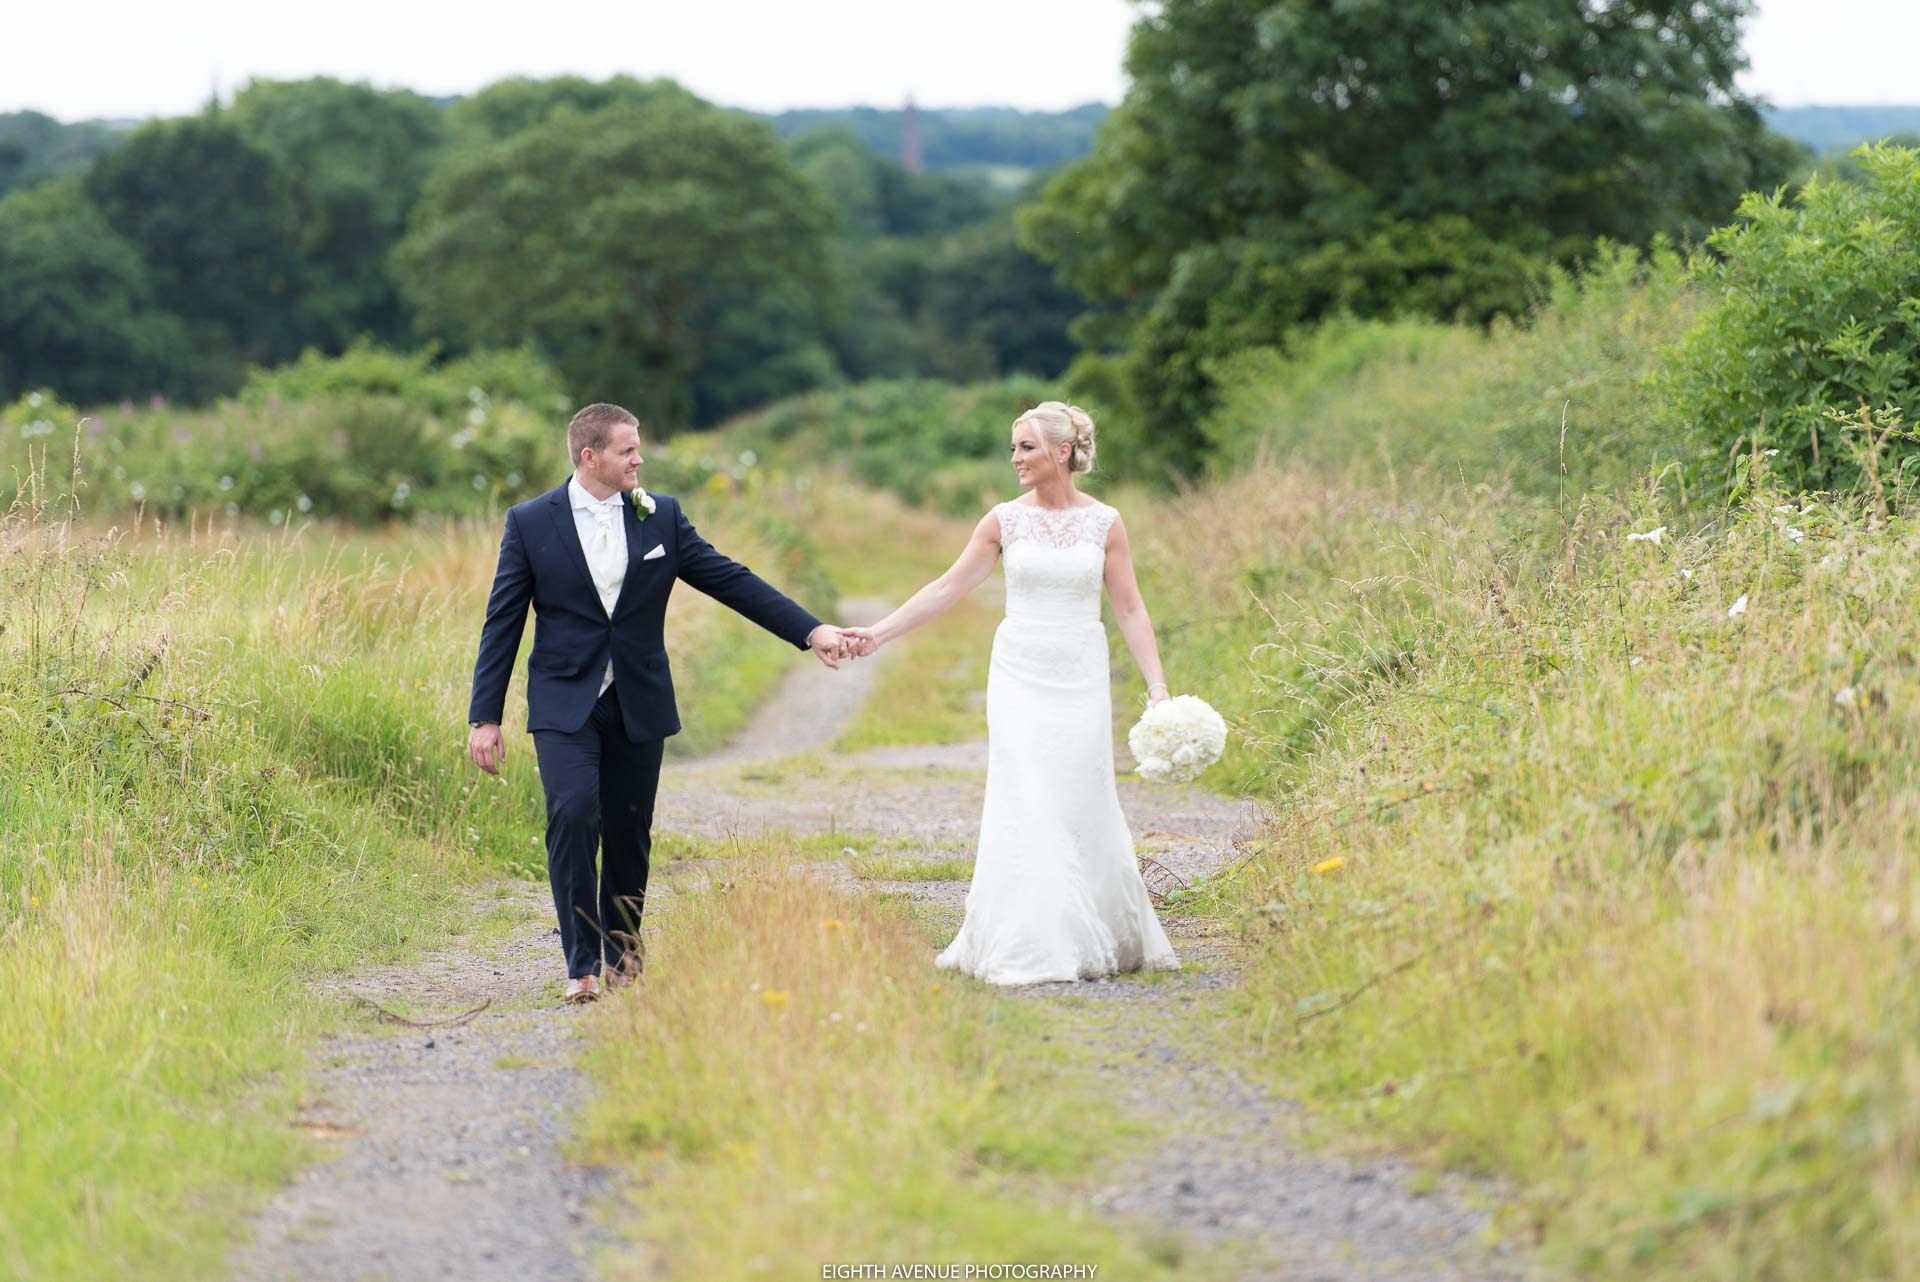 Bride and groom walking down lane at their Beeston Manor wedding